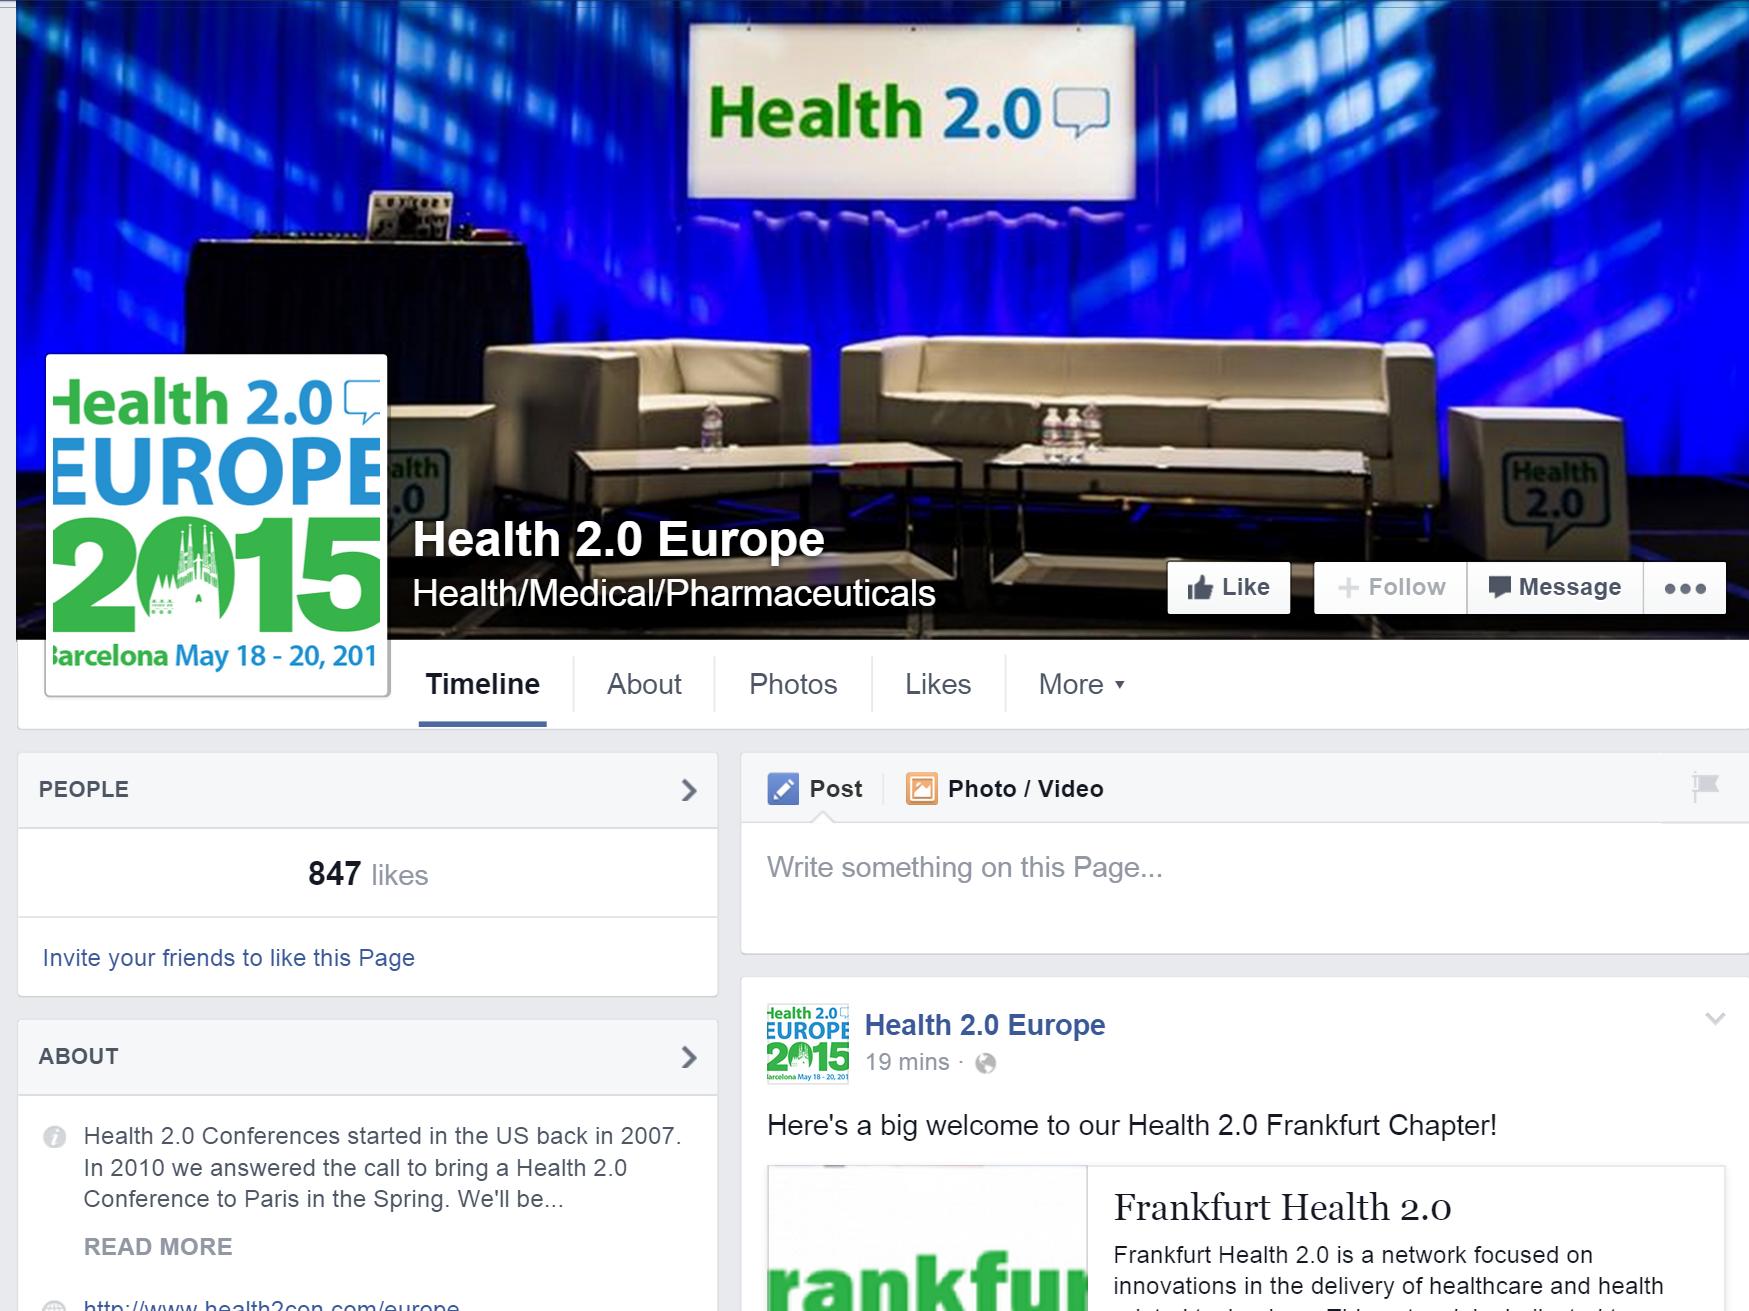 Health 2.0 Frankfurt